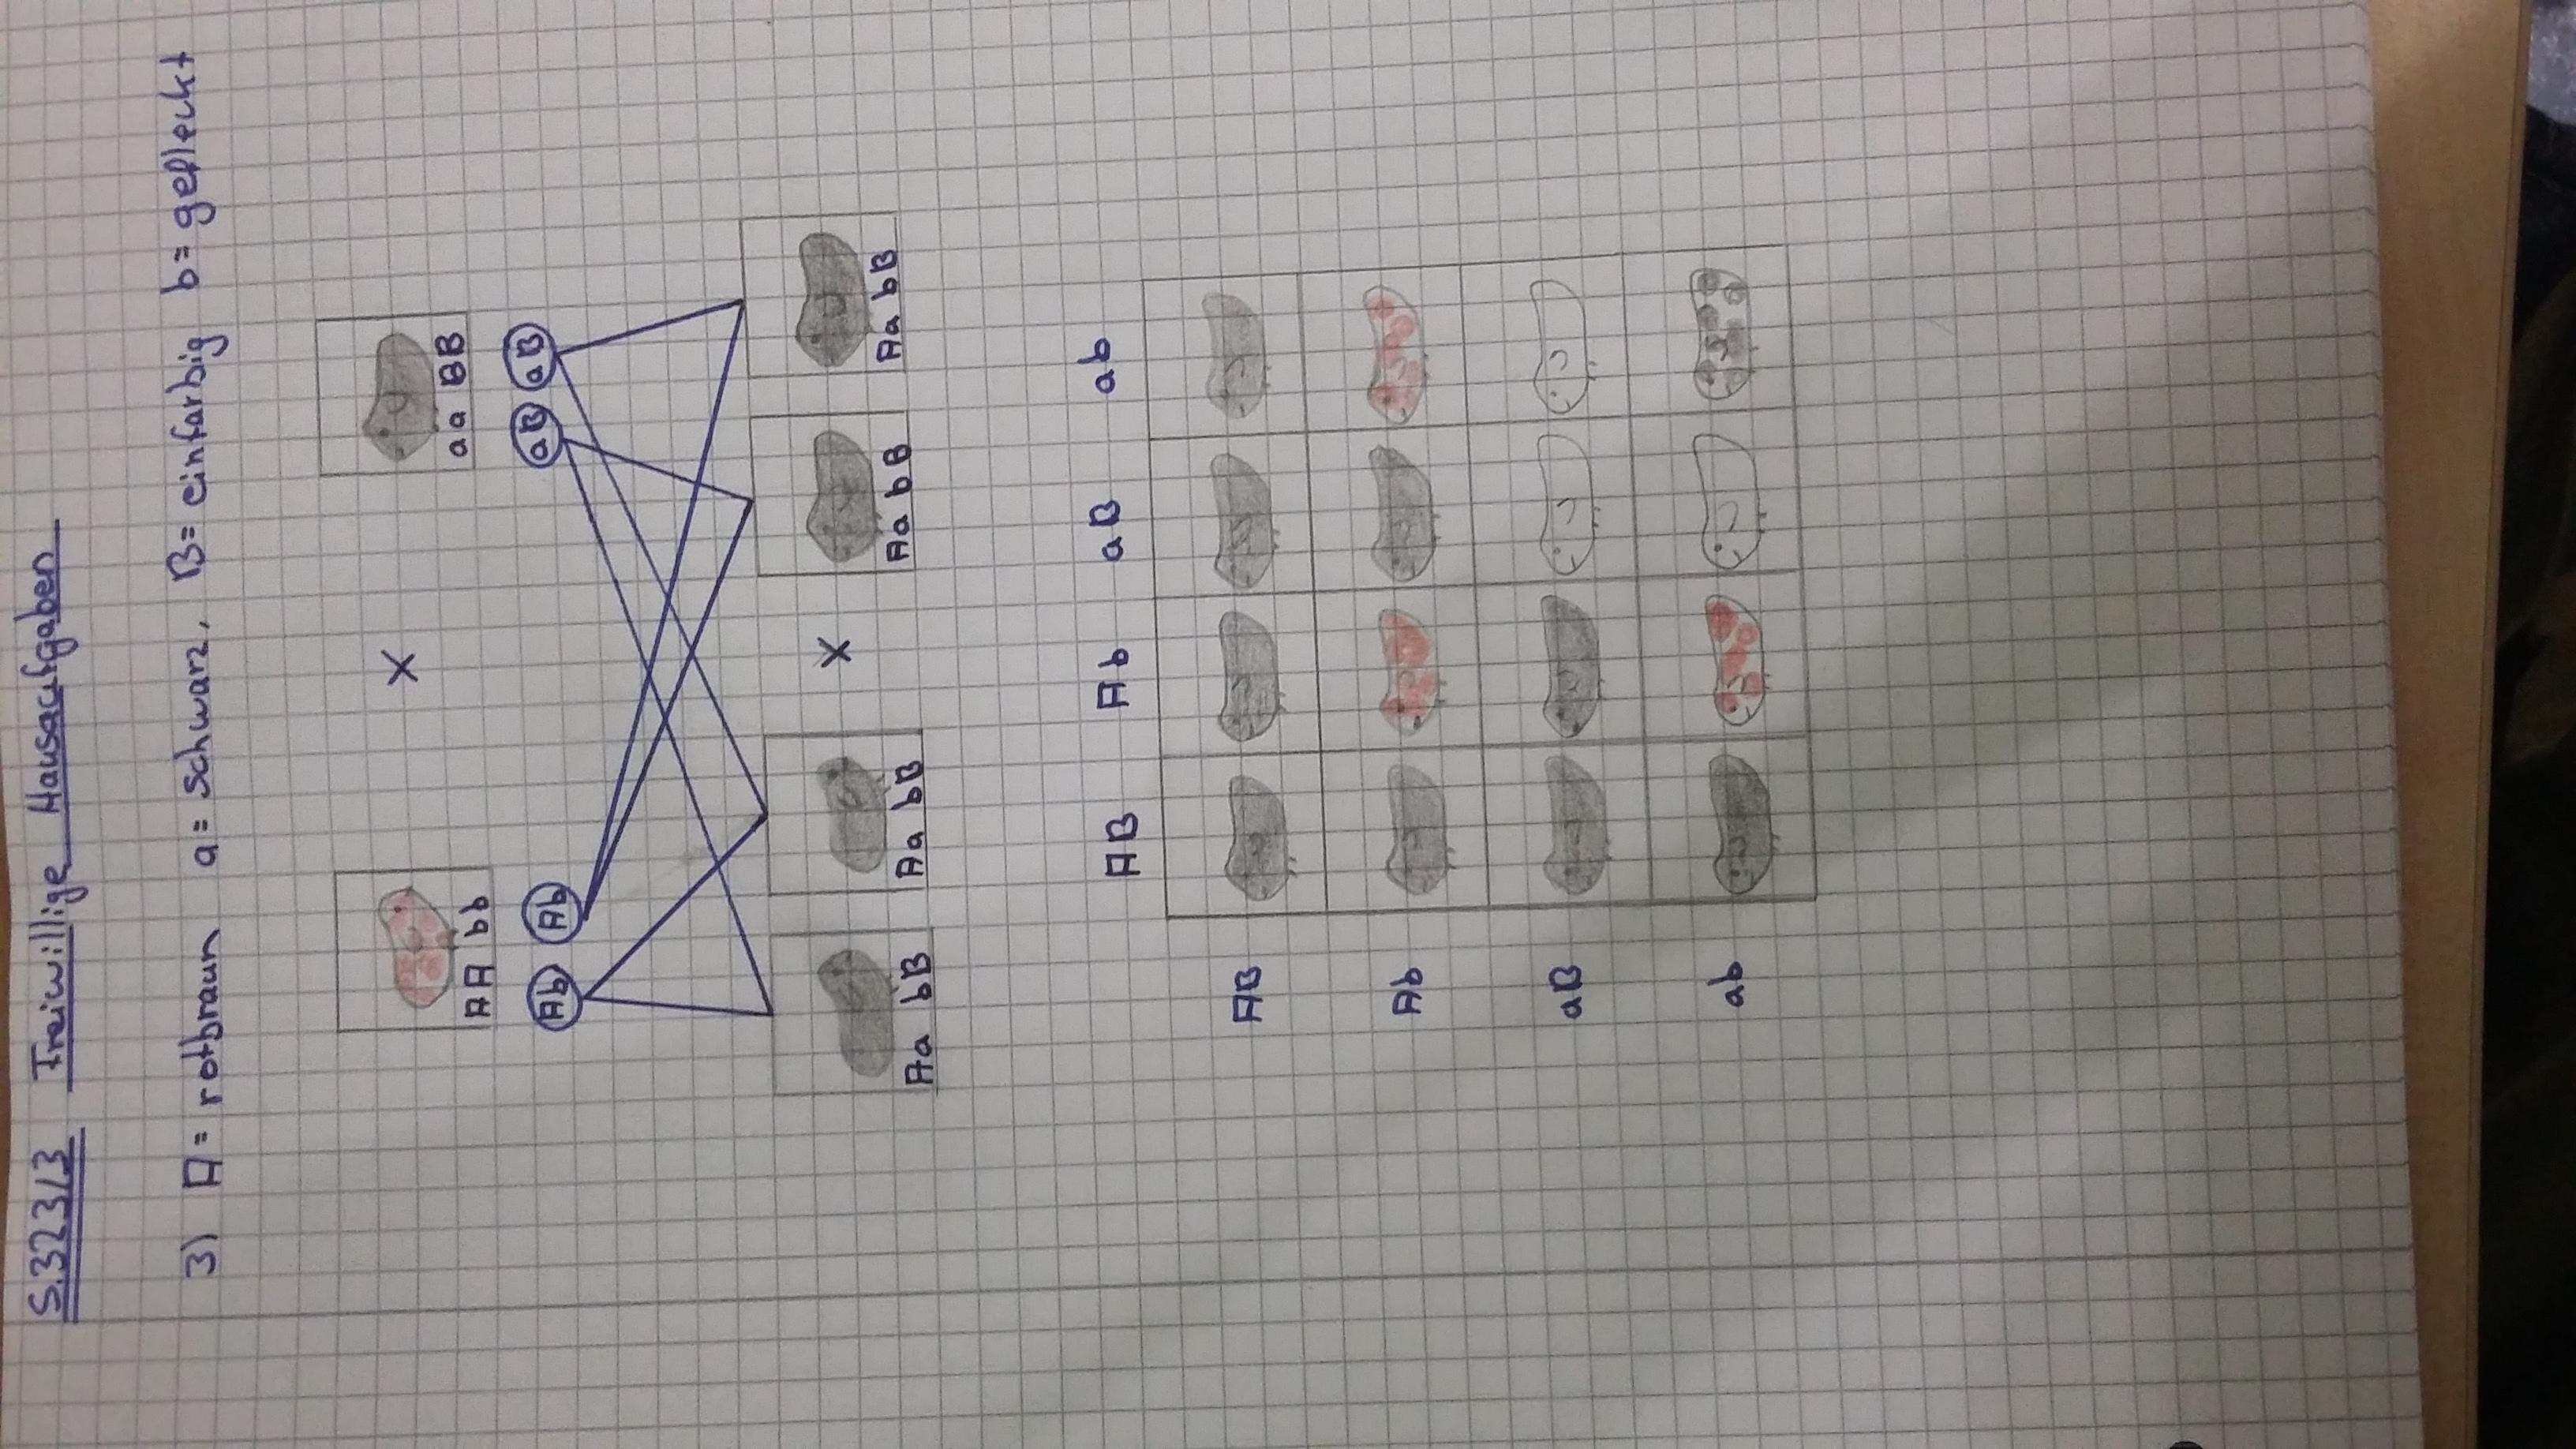 3. Mendel\'sche Regel Vererbung, Korrektur? (Biologie, Mendelsche)